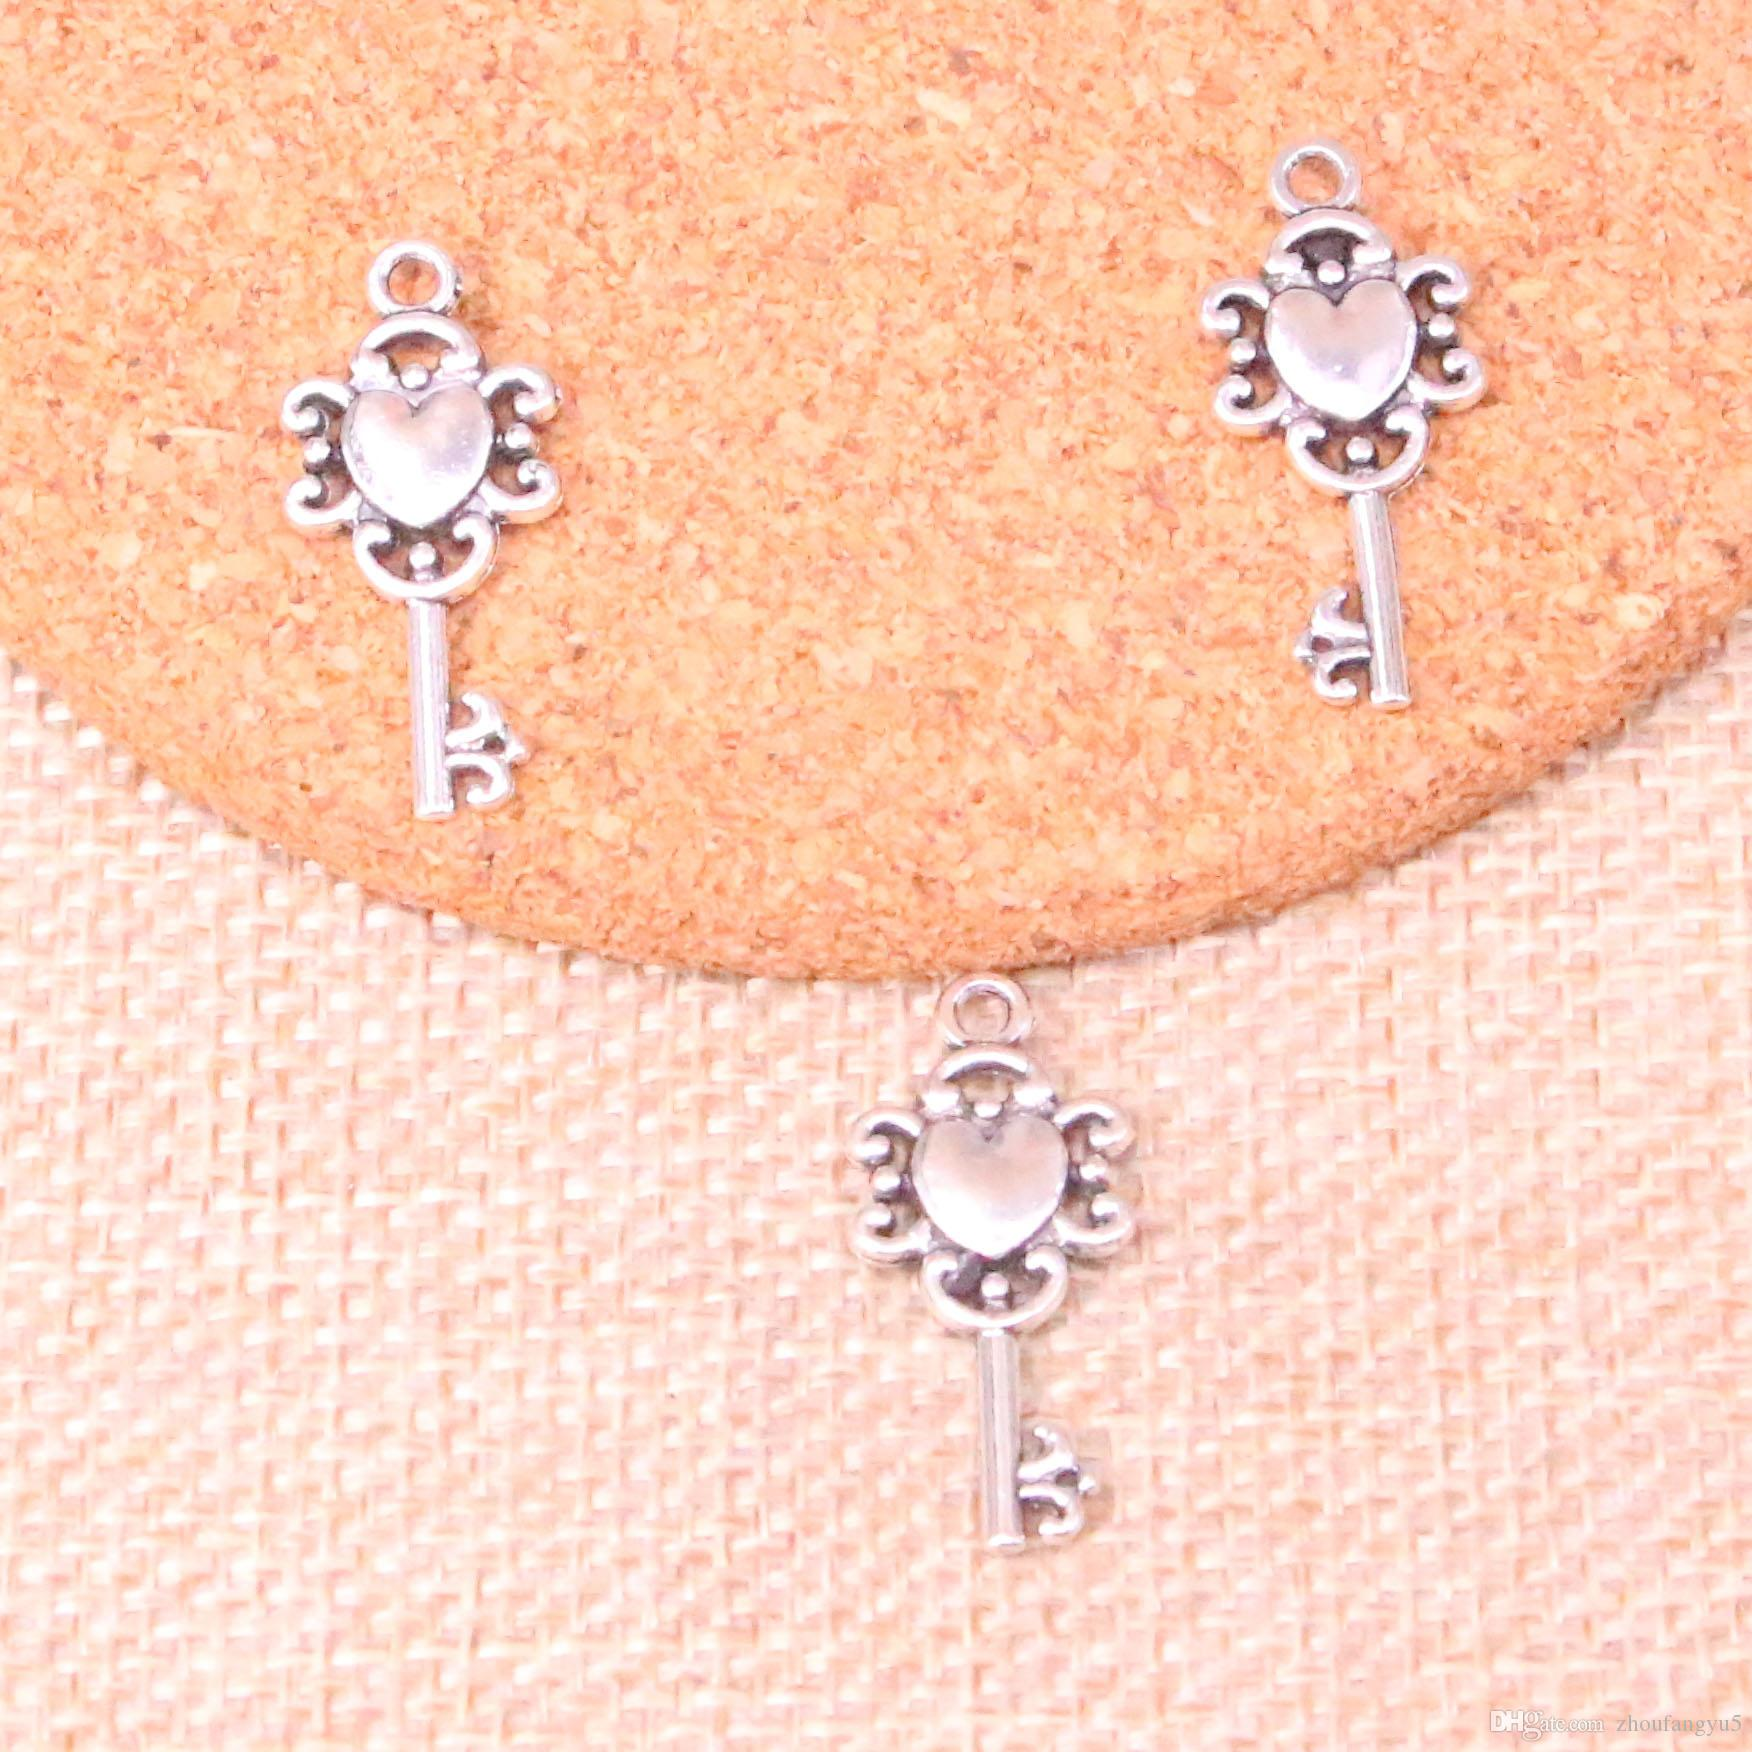 92pcs Charms retro treasure chest key 25*12mm Antique Making pendant fit,Vintage Tibetan Silver,DIY Handmade Jewelry